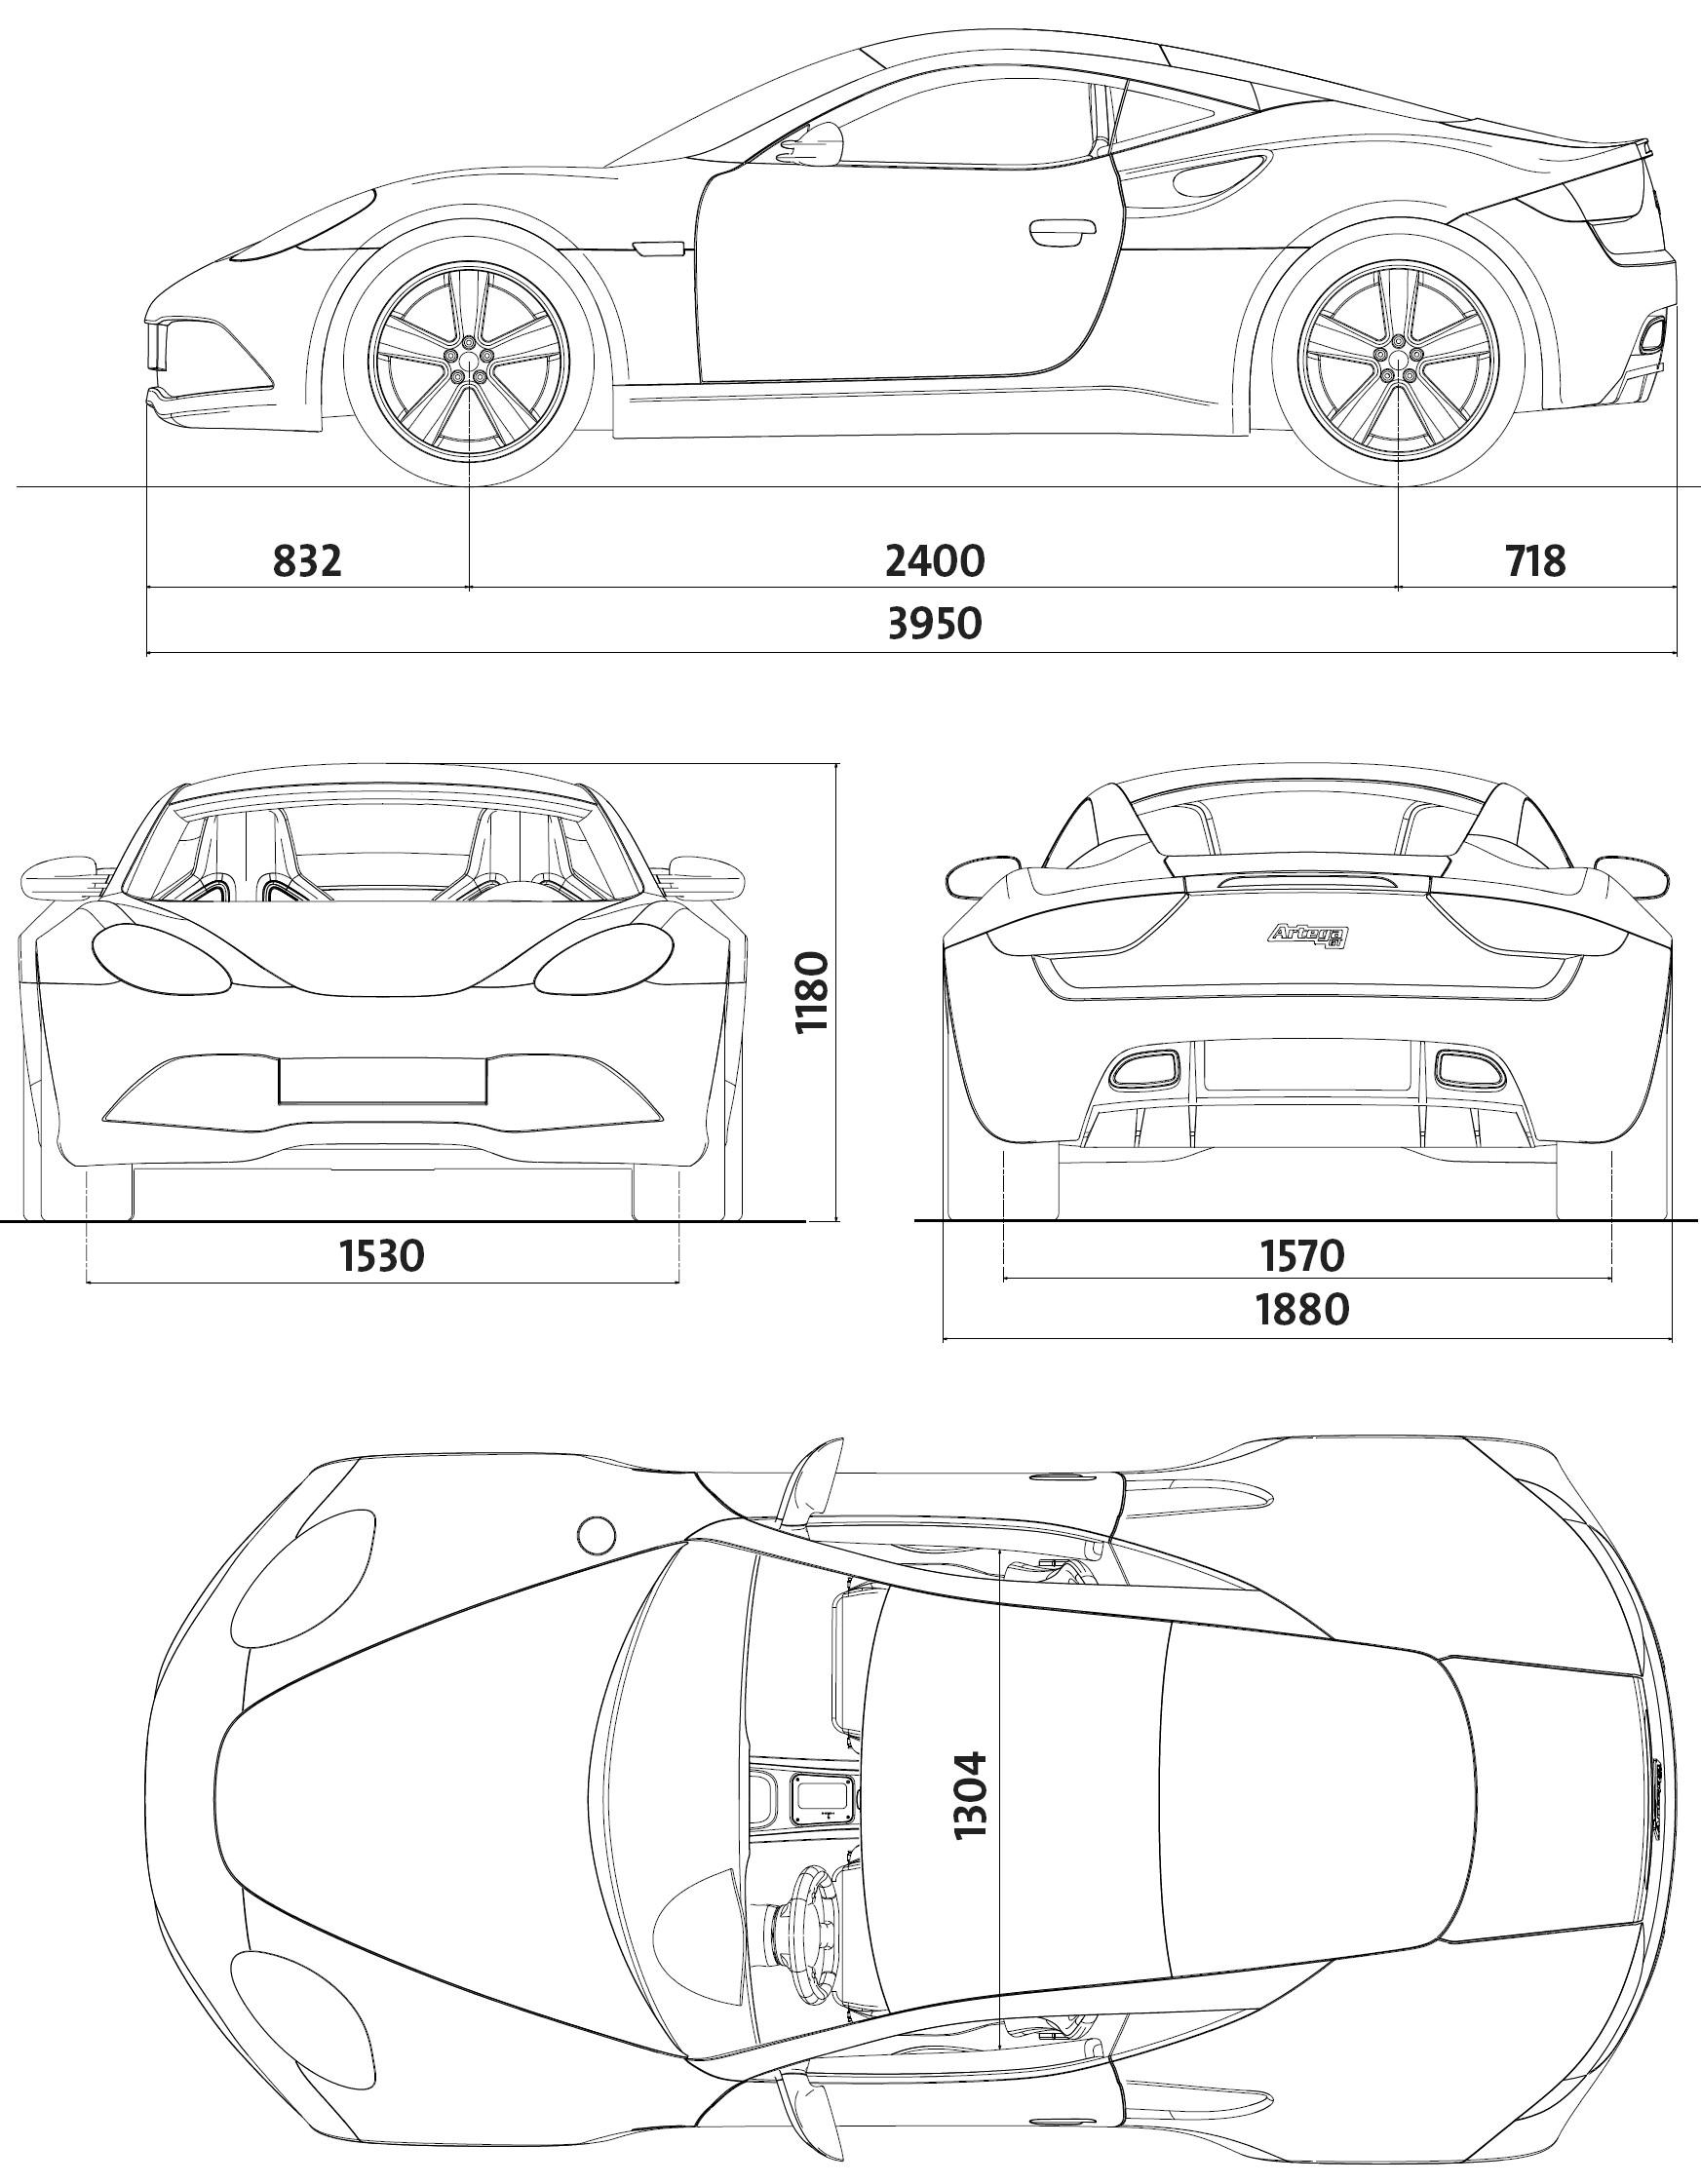 Artega GT blueprint